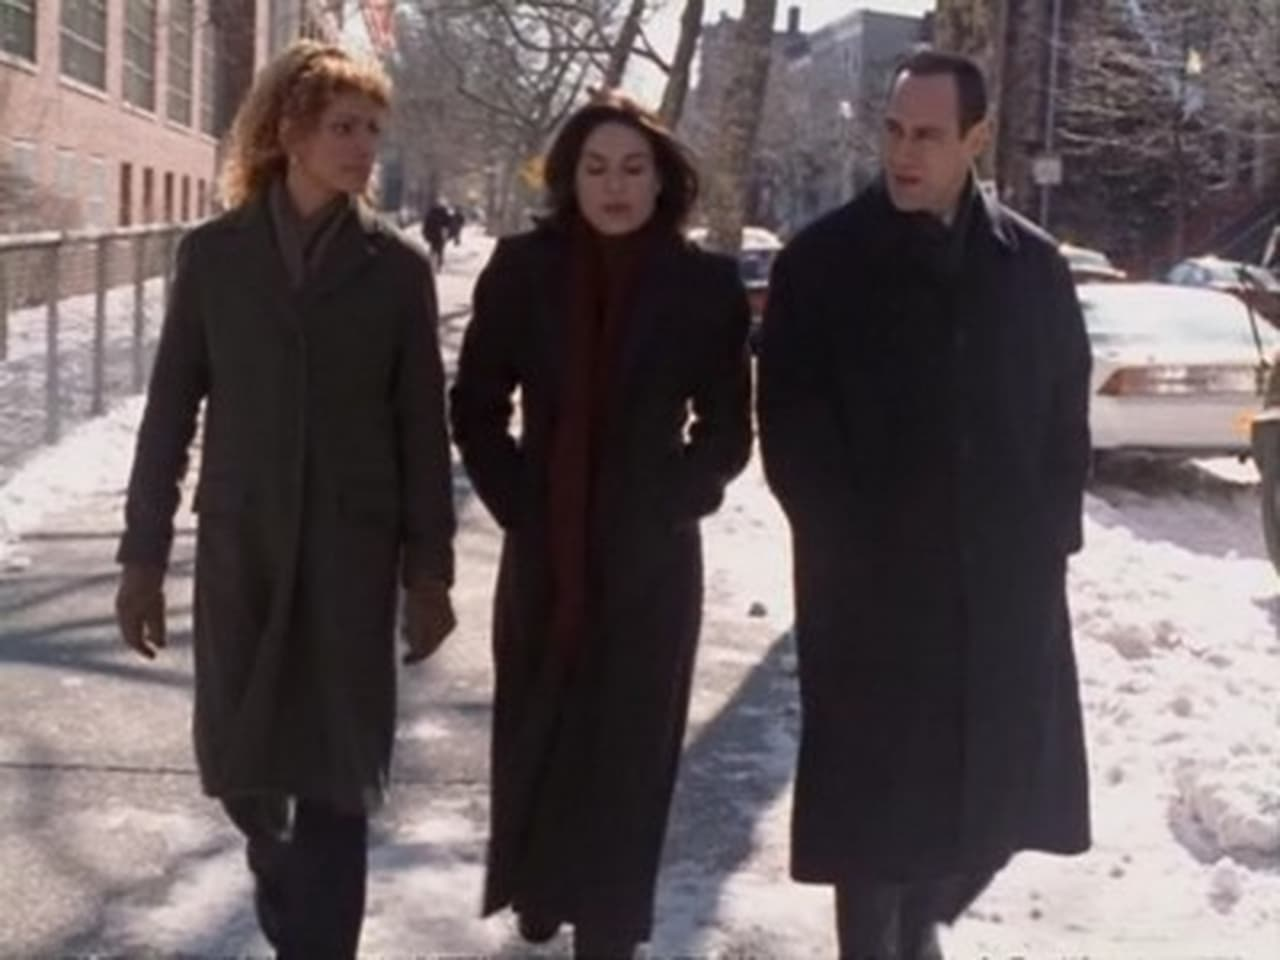 Law & Order: Special Victims Unit - Season 1 Episode 21 : Nocturne